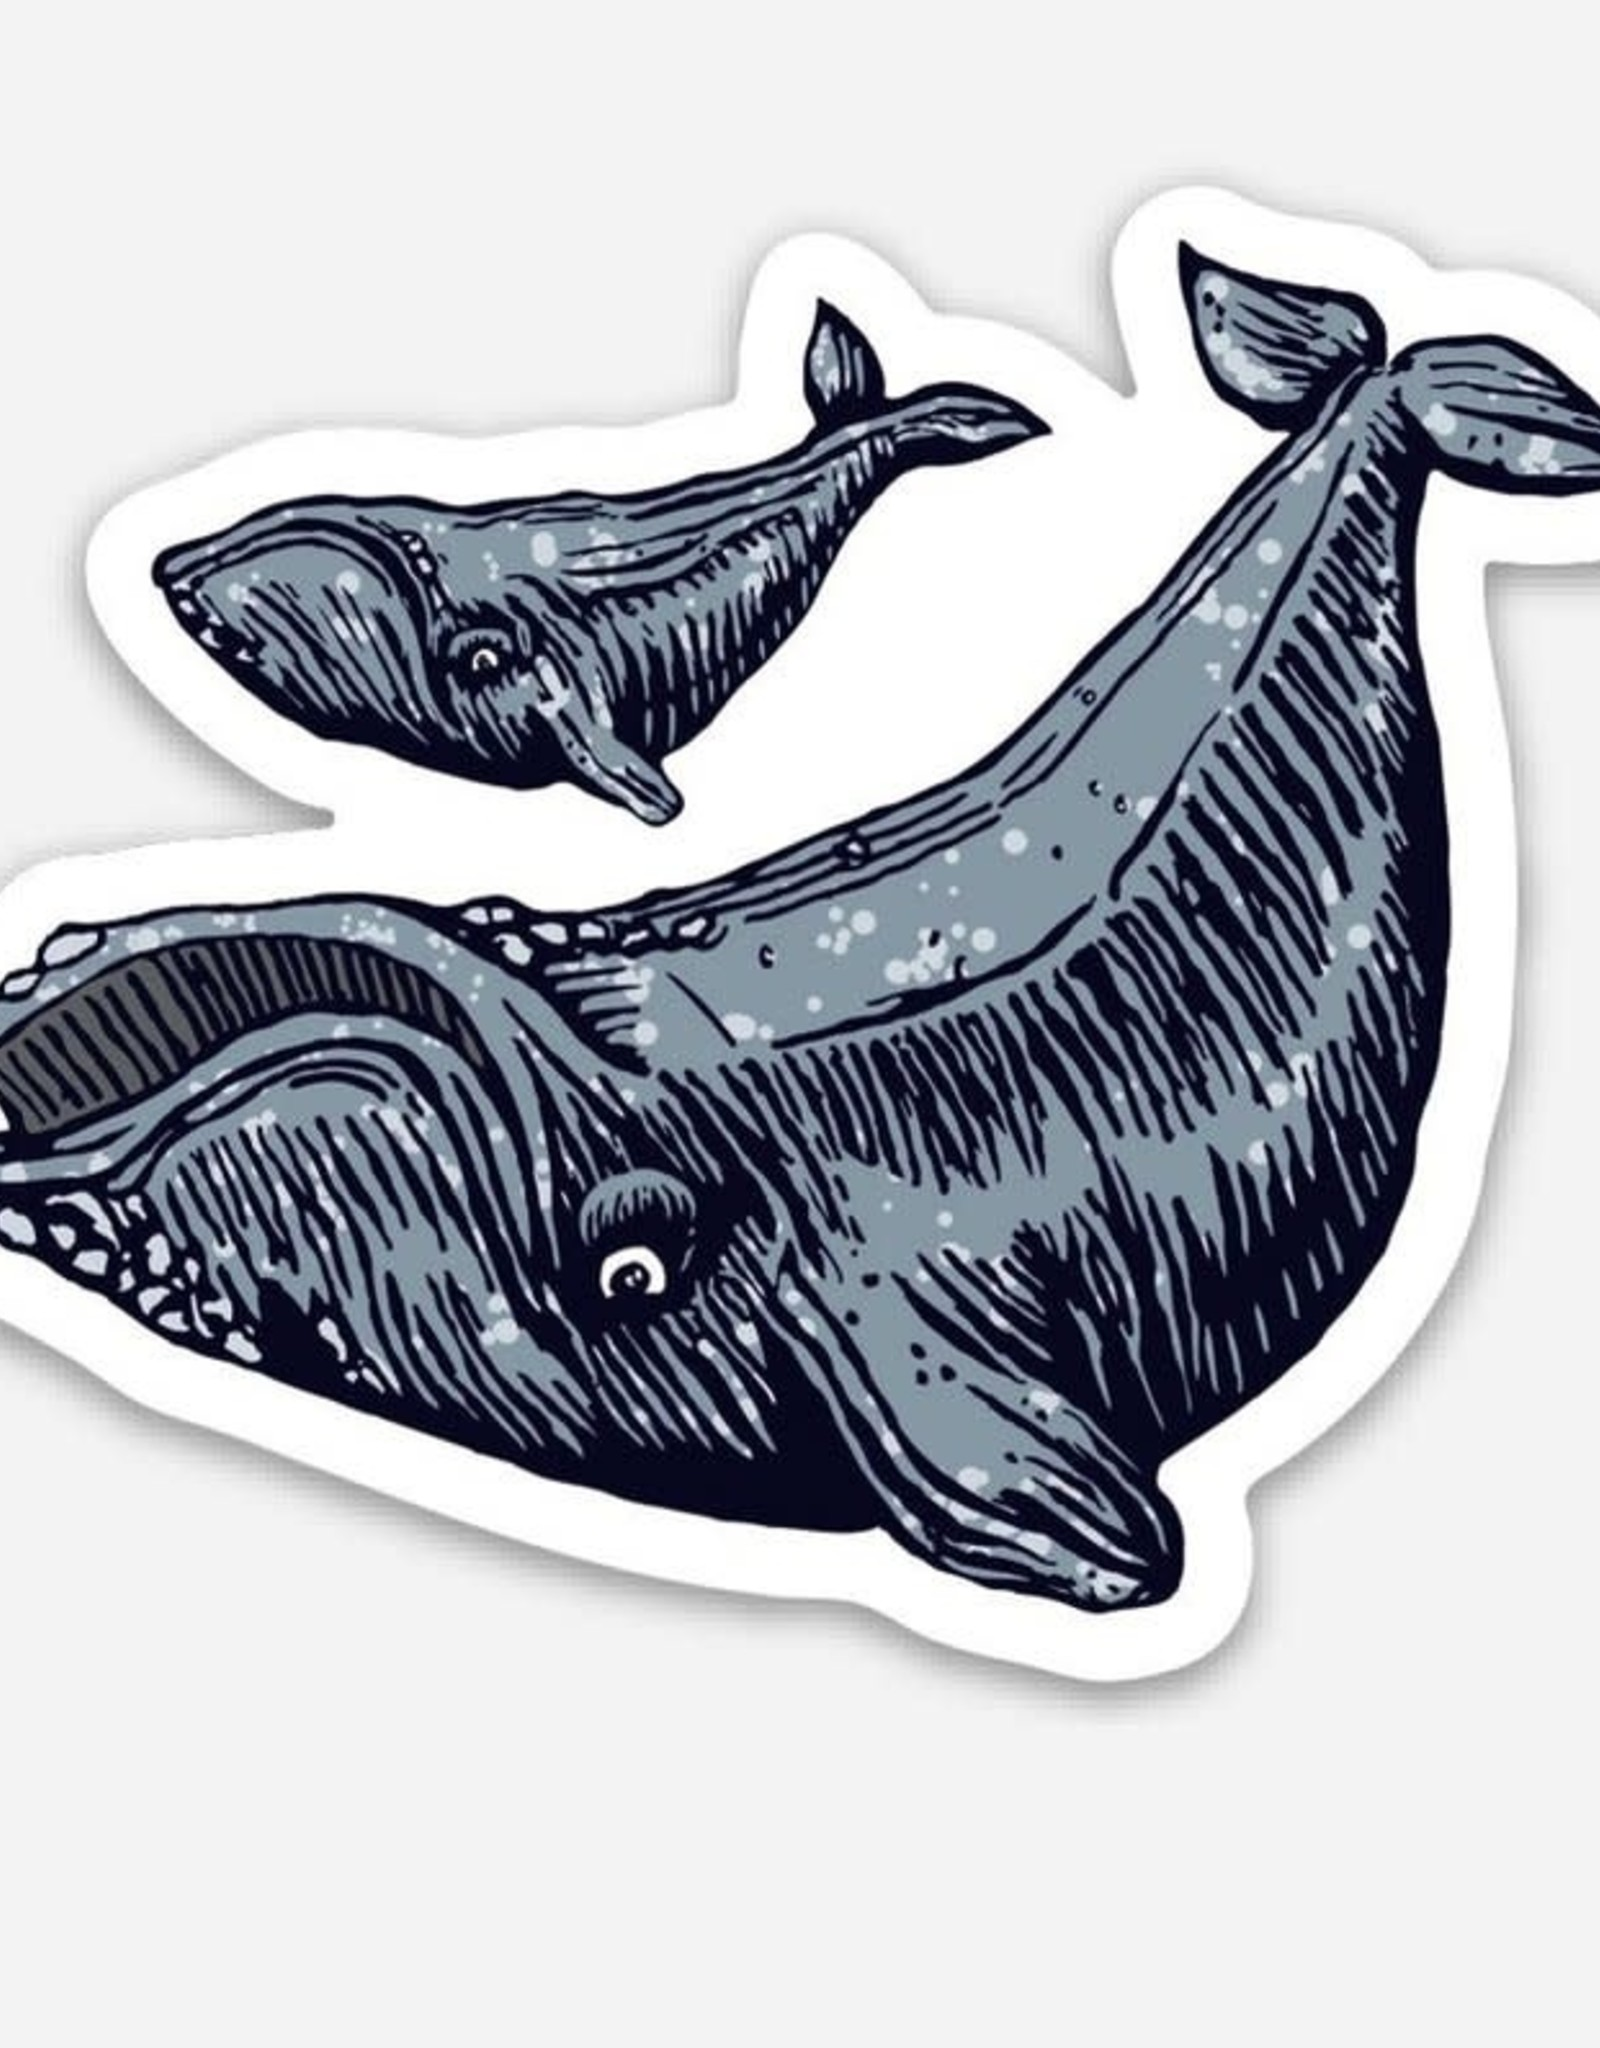 Spofford Press Bowhead Whales Vinyl Sticker